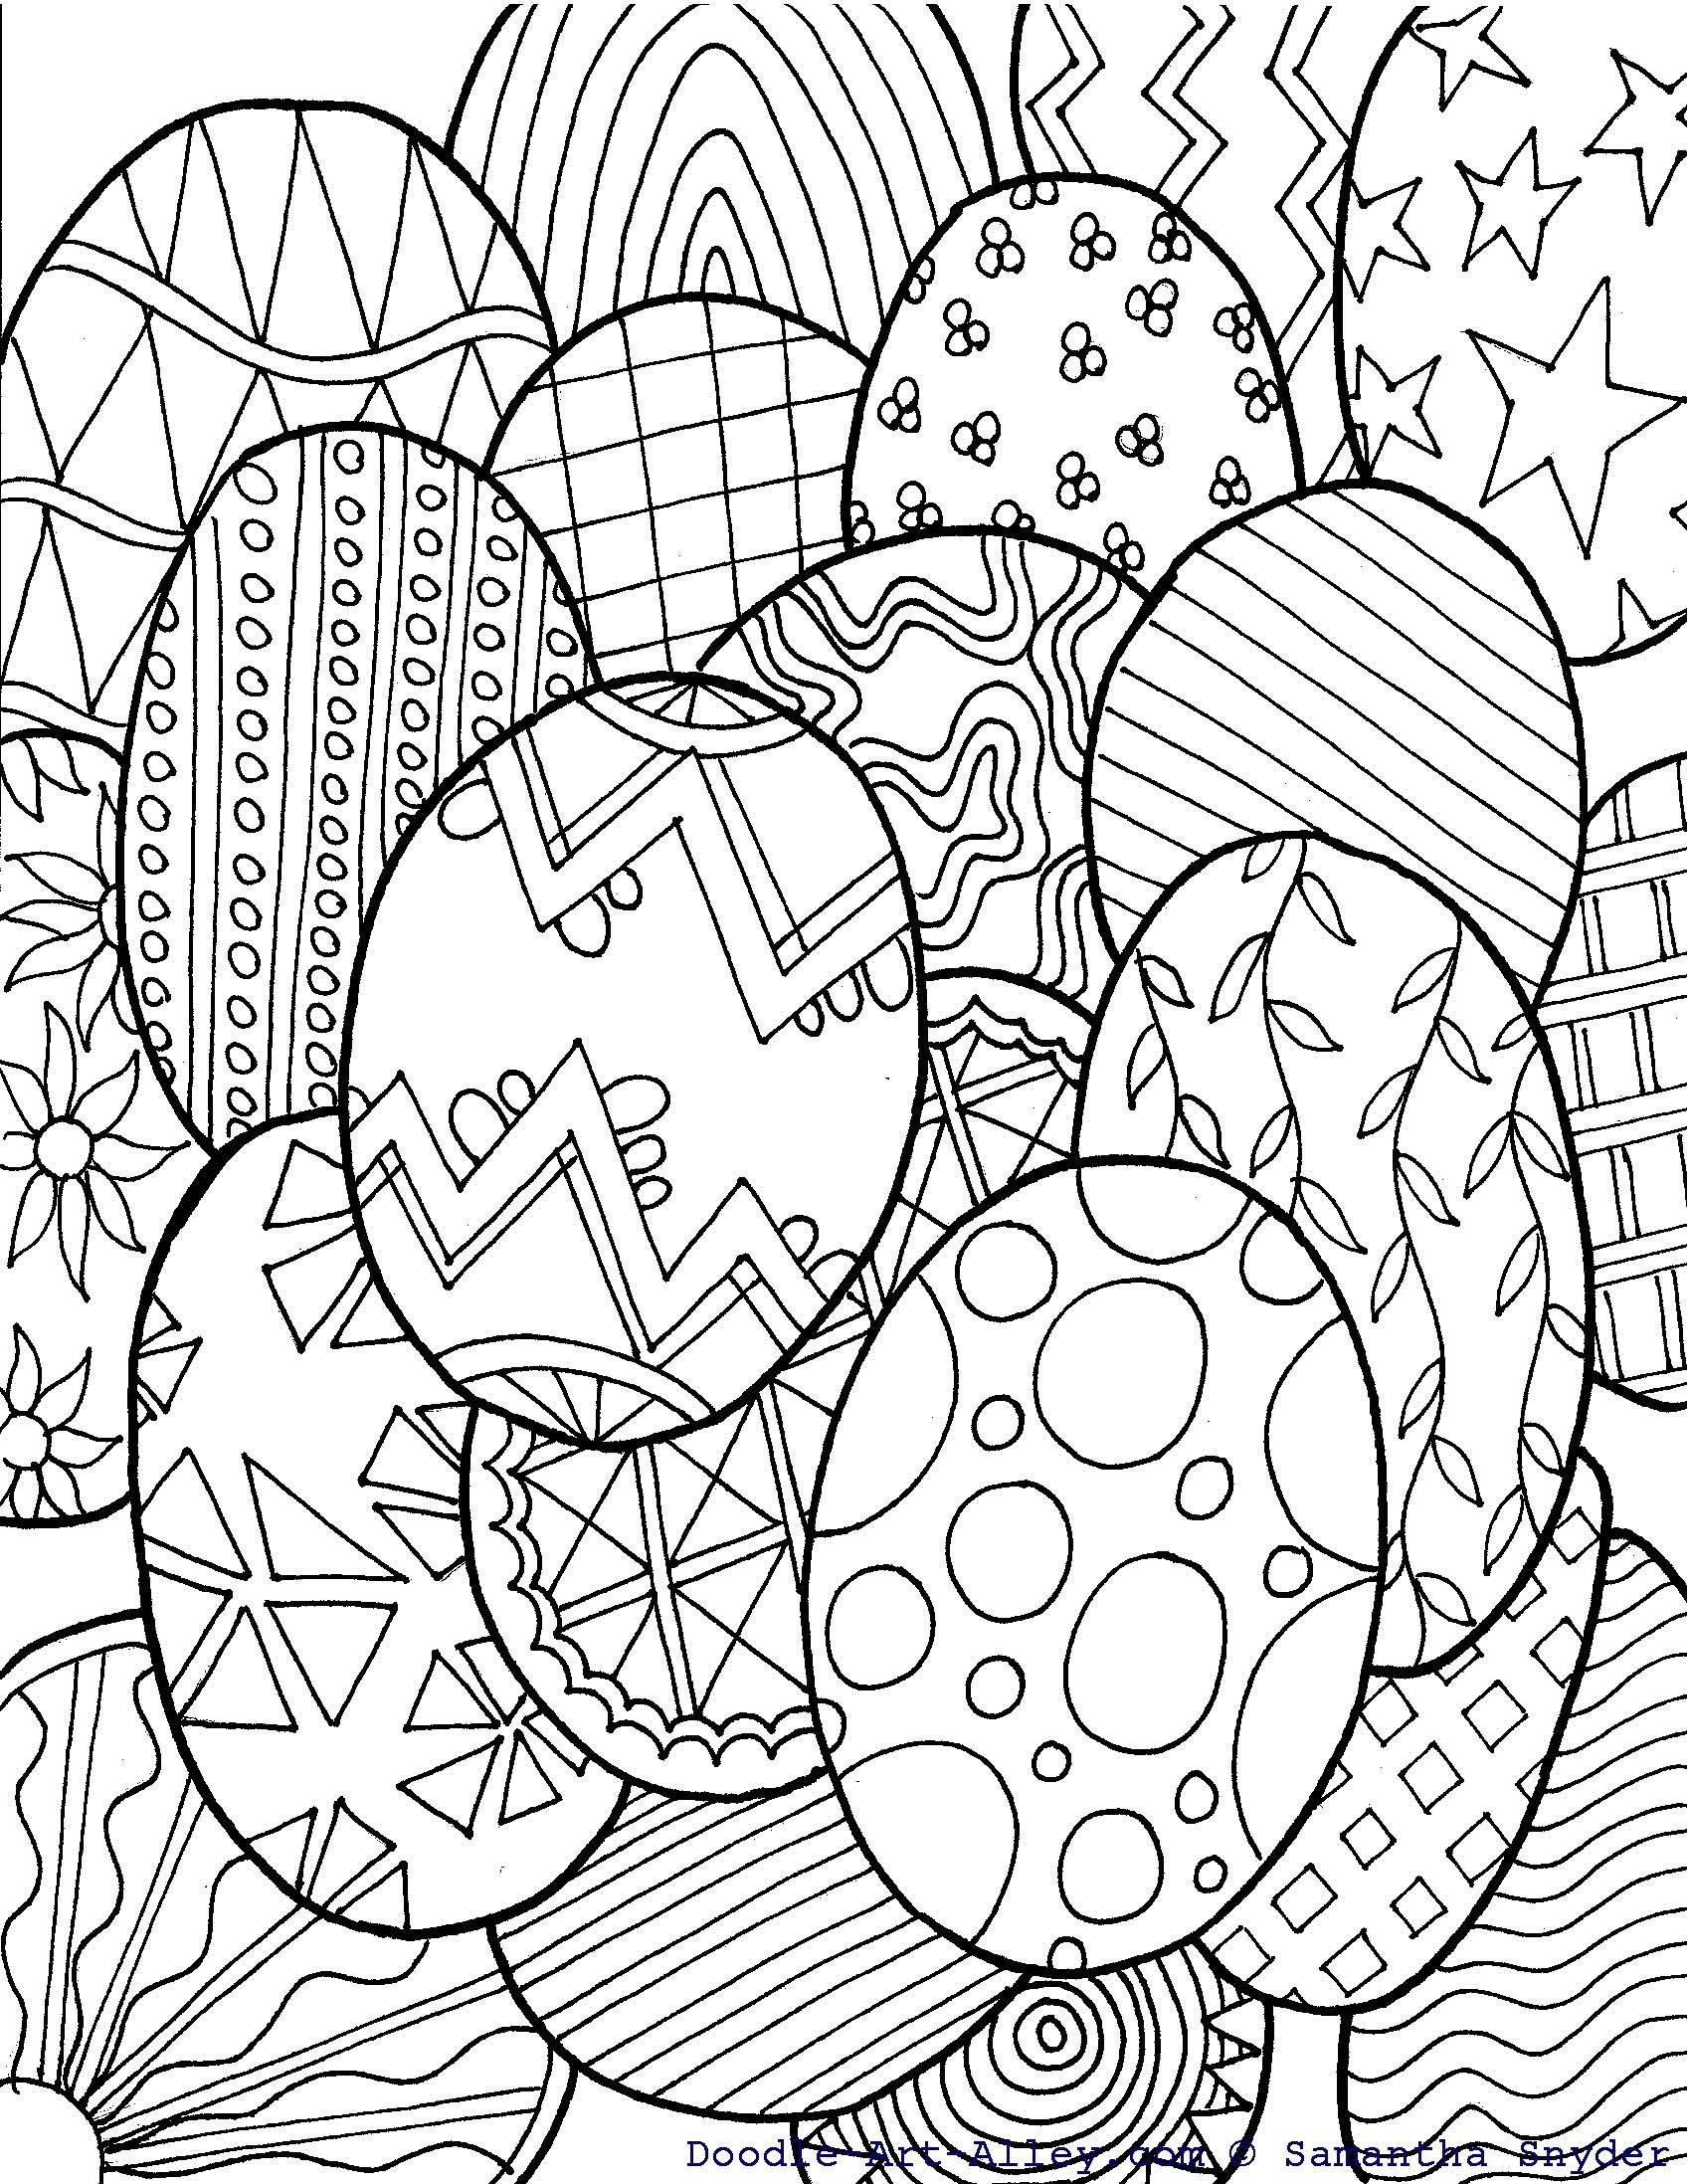 Mandala oeufs de Pâques | Mandala | Pinterest | Ausmalbilder ...